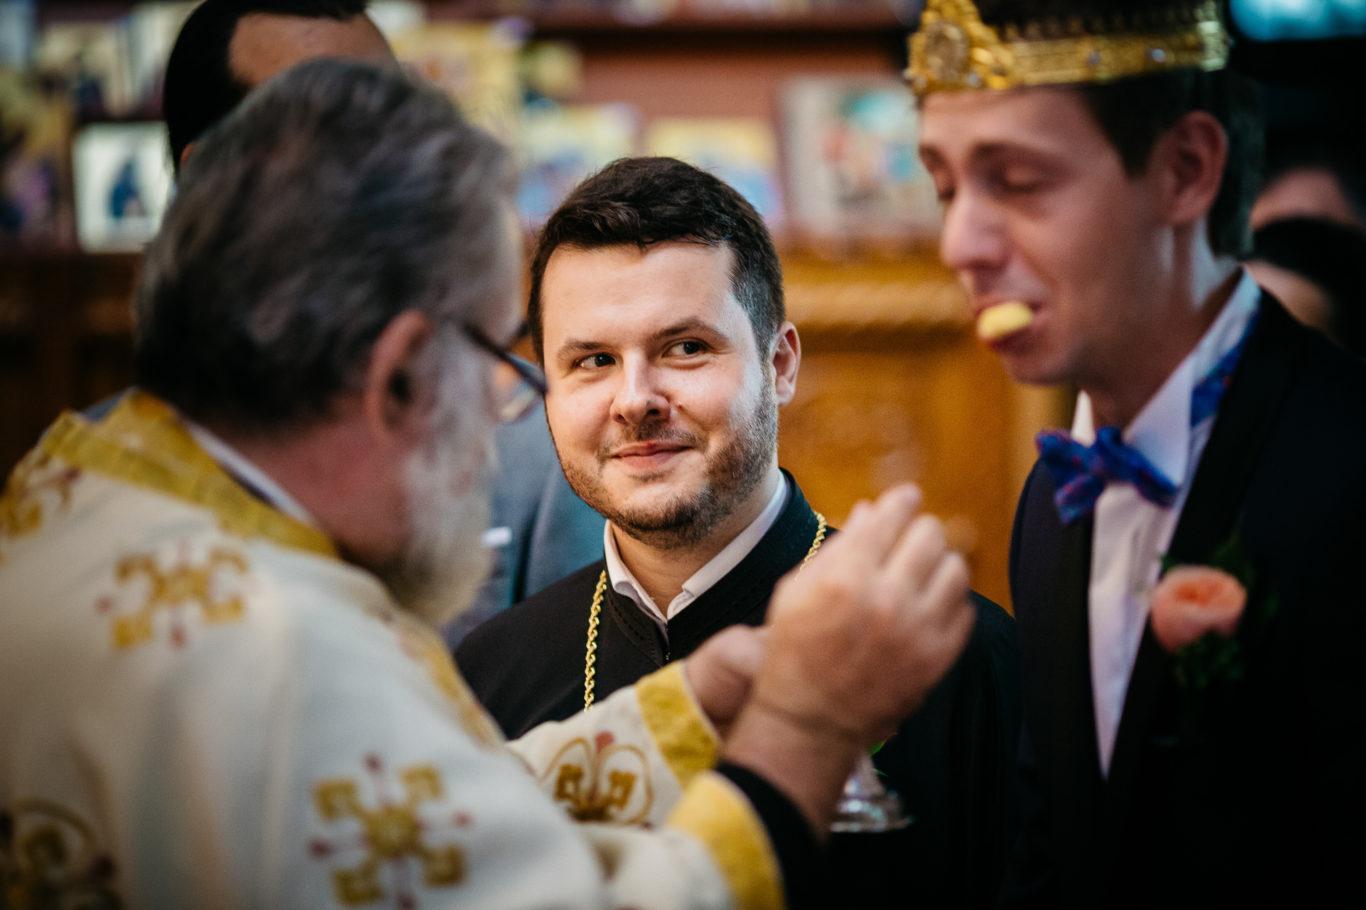 0393-Fotografie-nunta-Bucuresti-Oana-Catalin-fotograf-Ciprian-Dumitrescu-CDF_0588